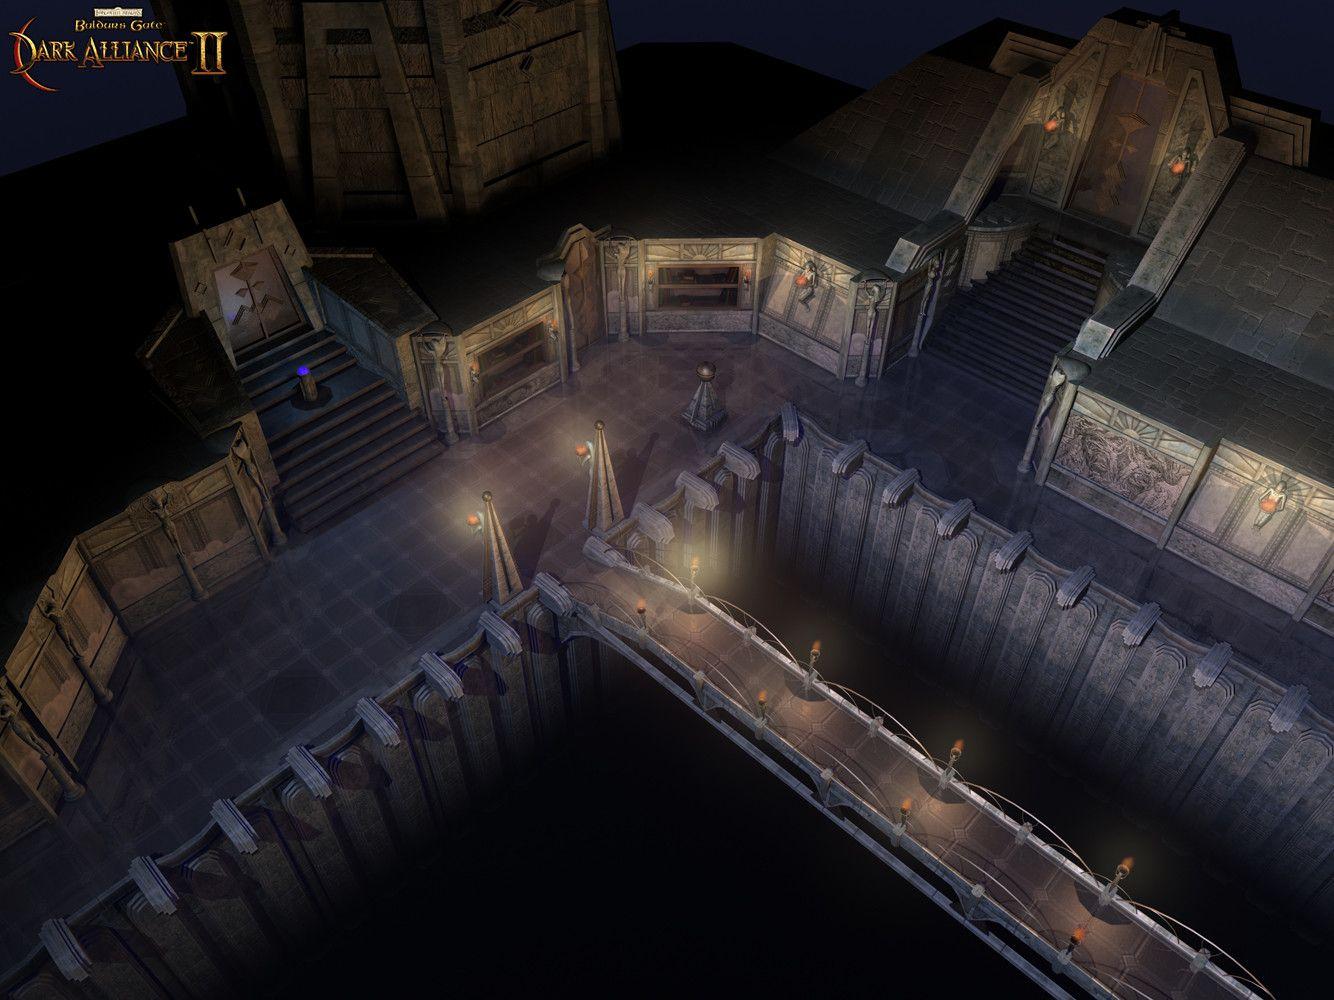 Baldur S Gate 2 Tile Set Mike Colonnese On Artstation At Https